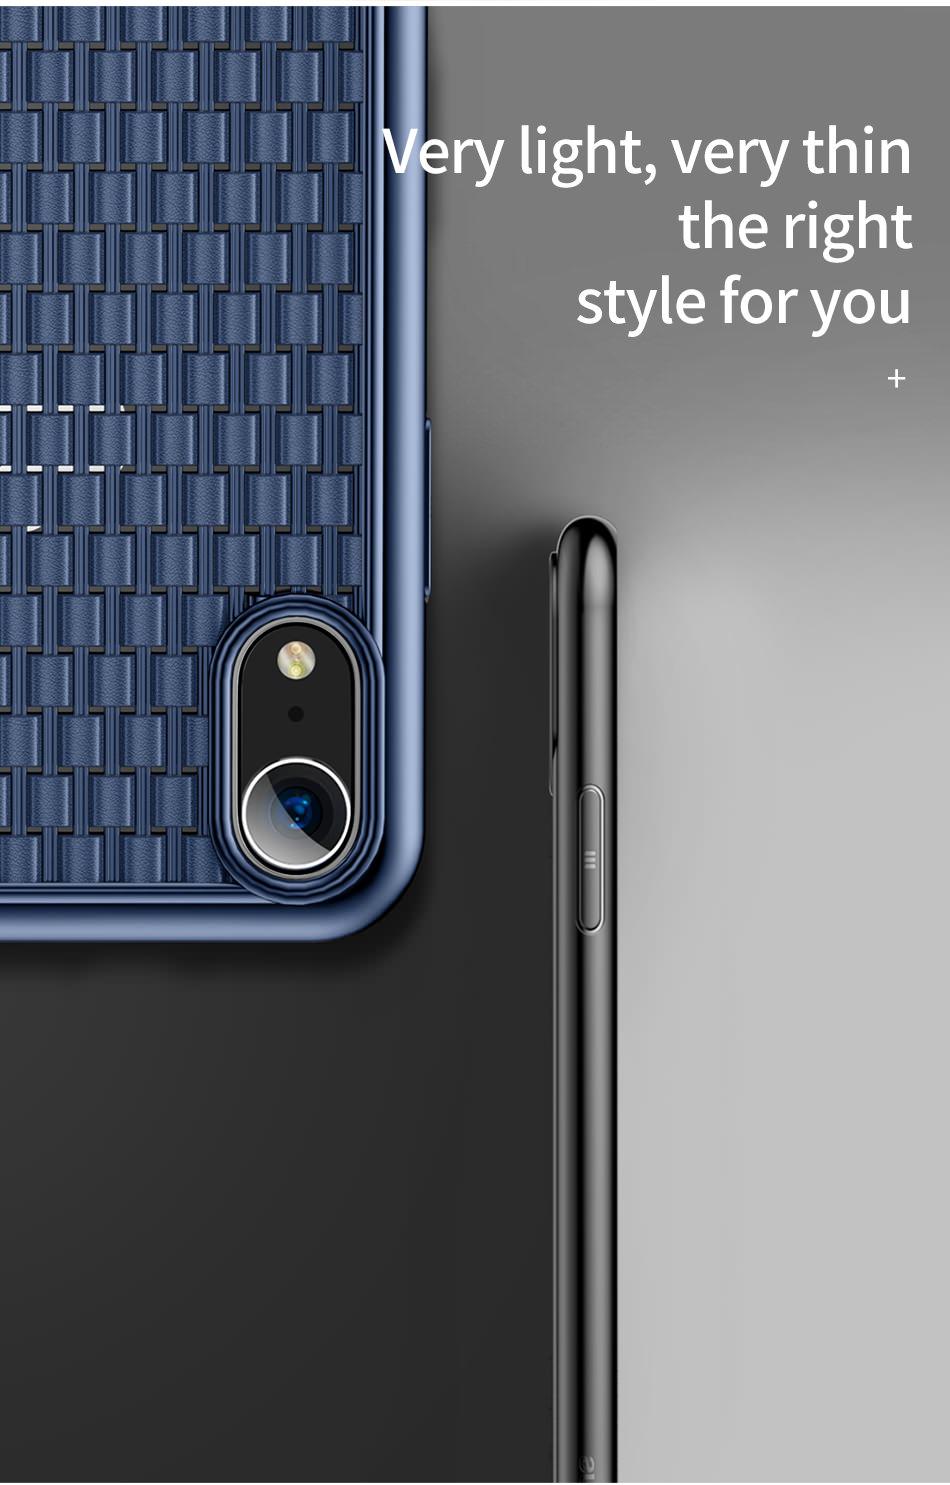 new iphone xs case